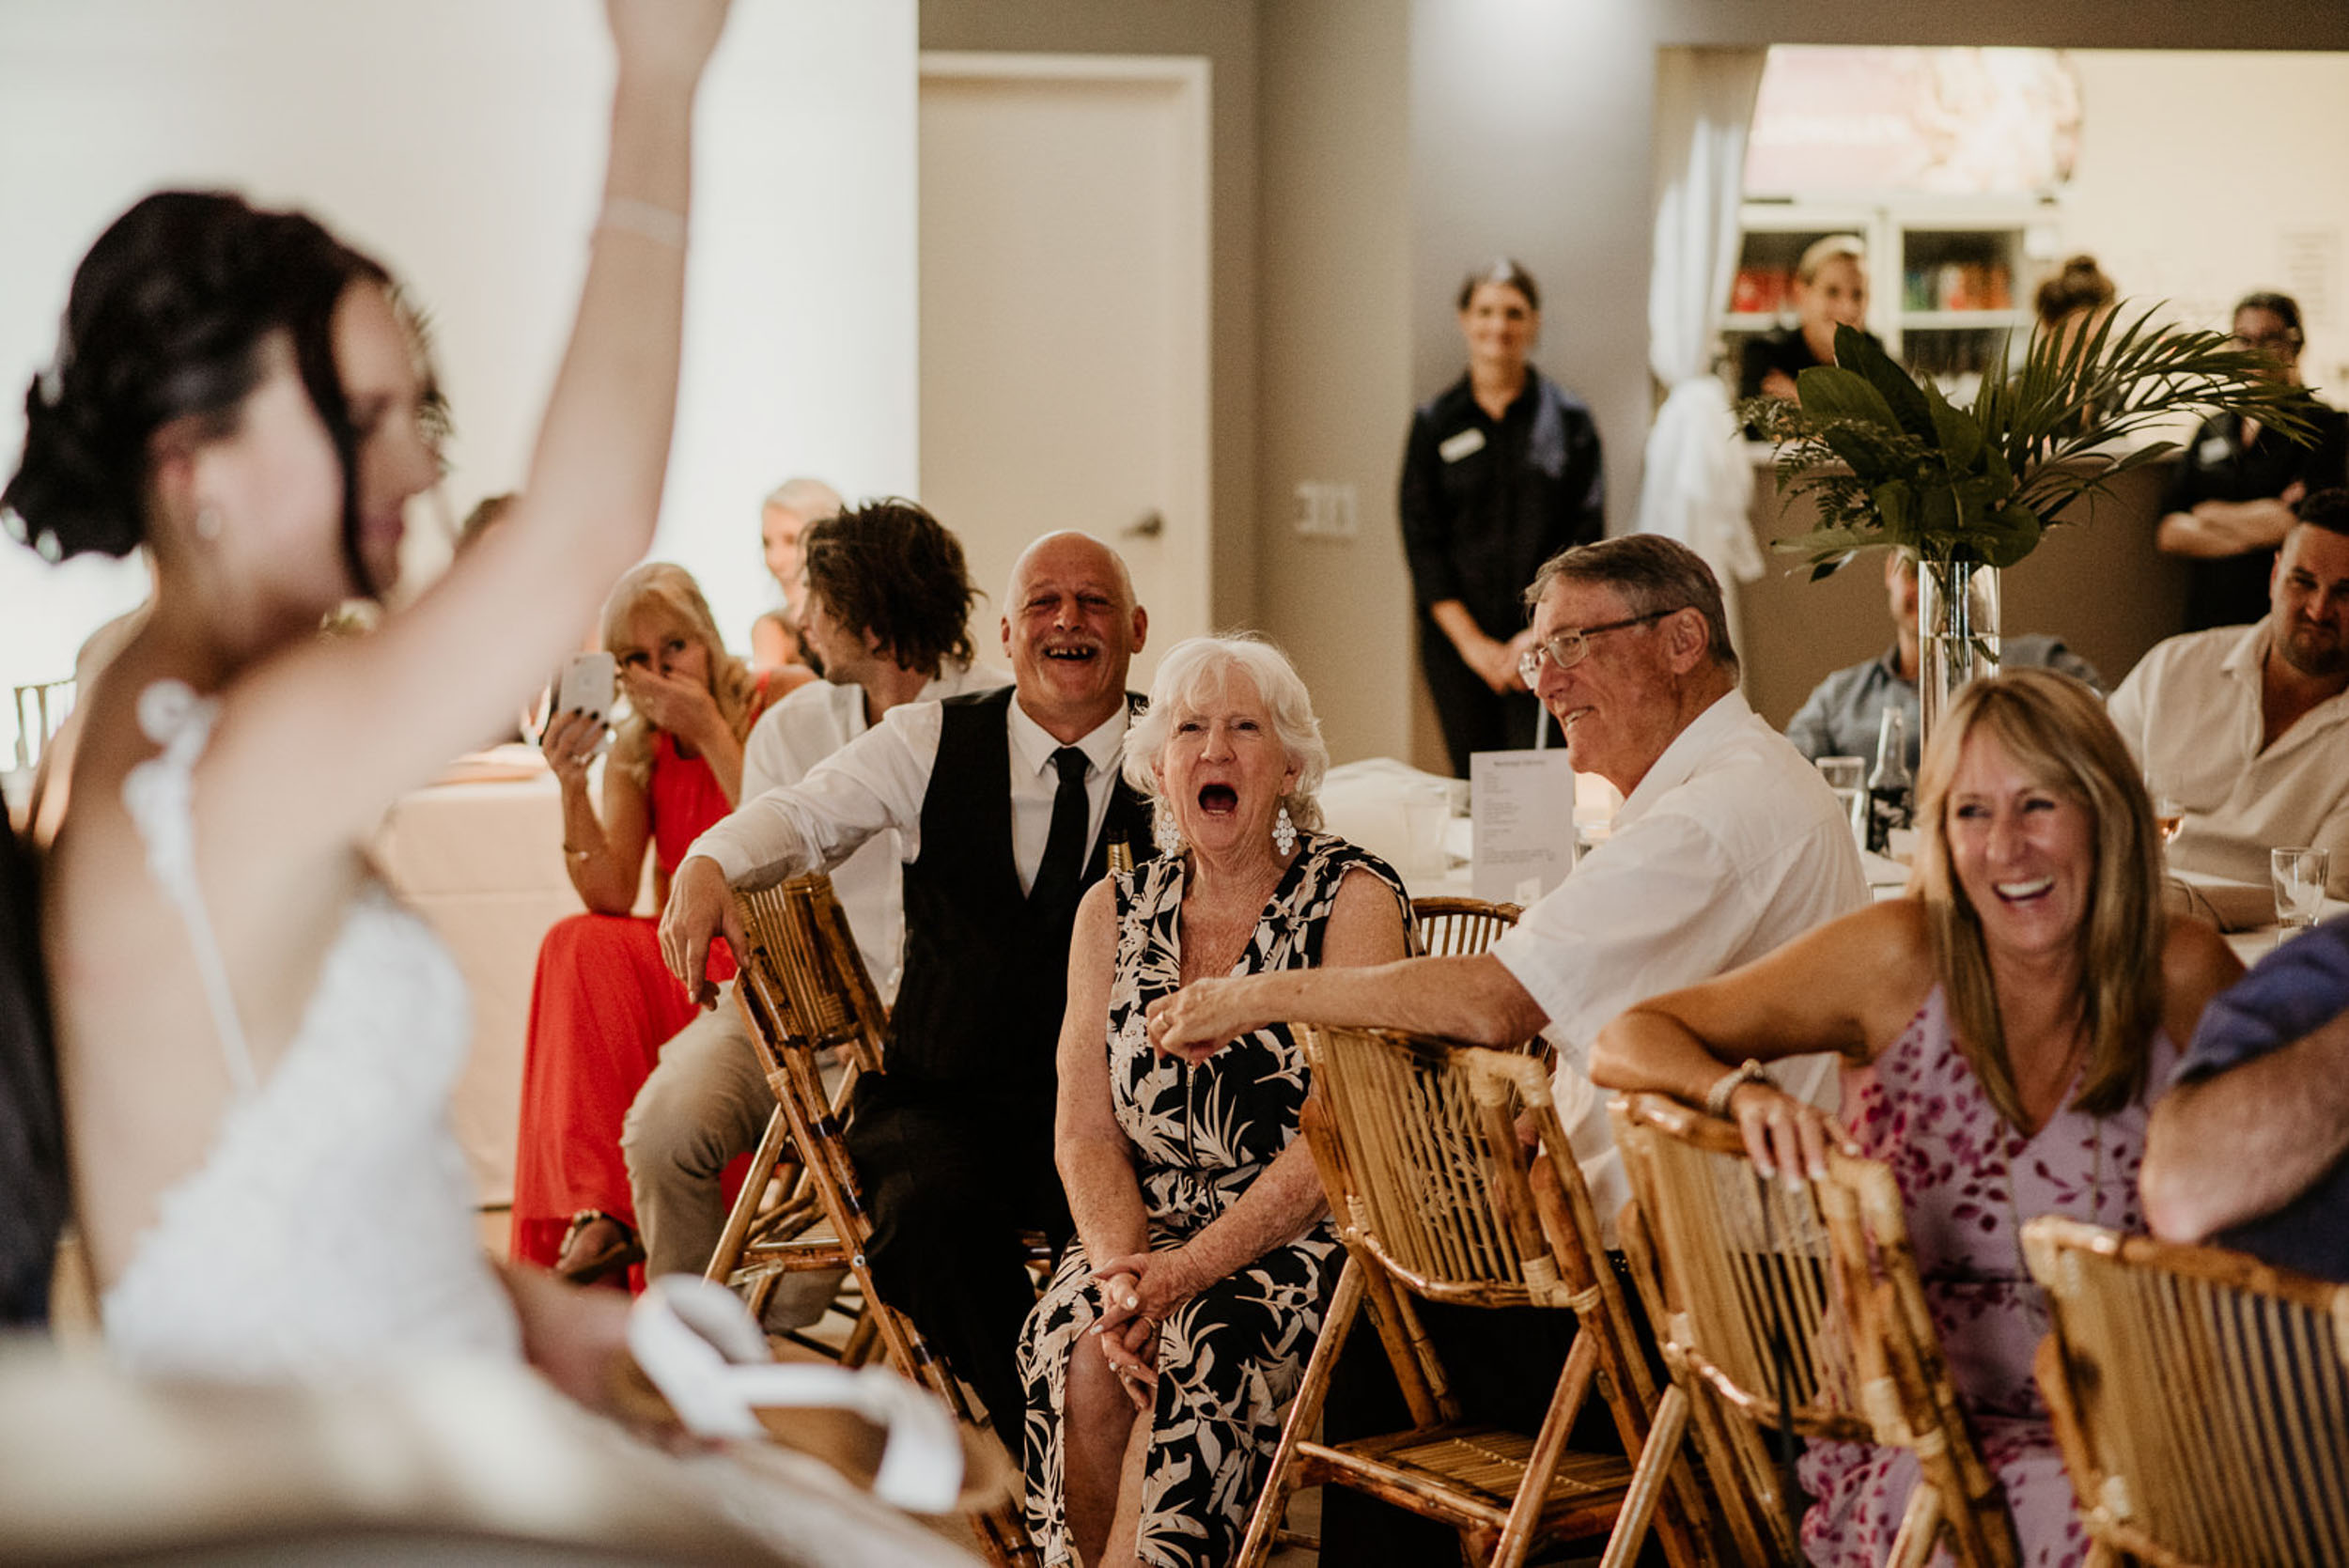 The Raw Photographer - Cairns Wedding Photographer - Fitzroy Island - Destination Wedding - Bride Dress - Groom Portrait - Queensland-46.jpg